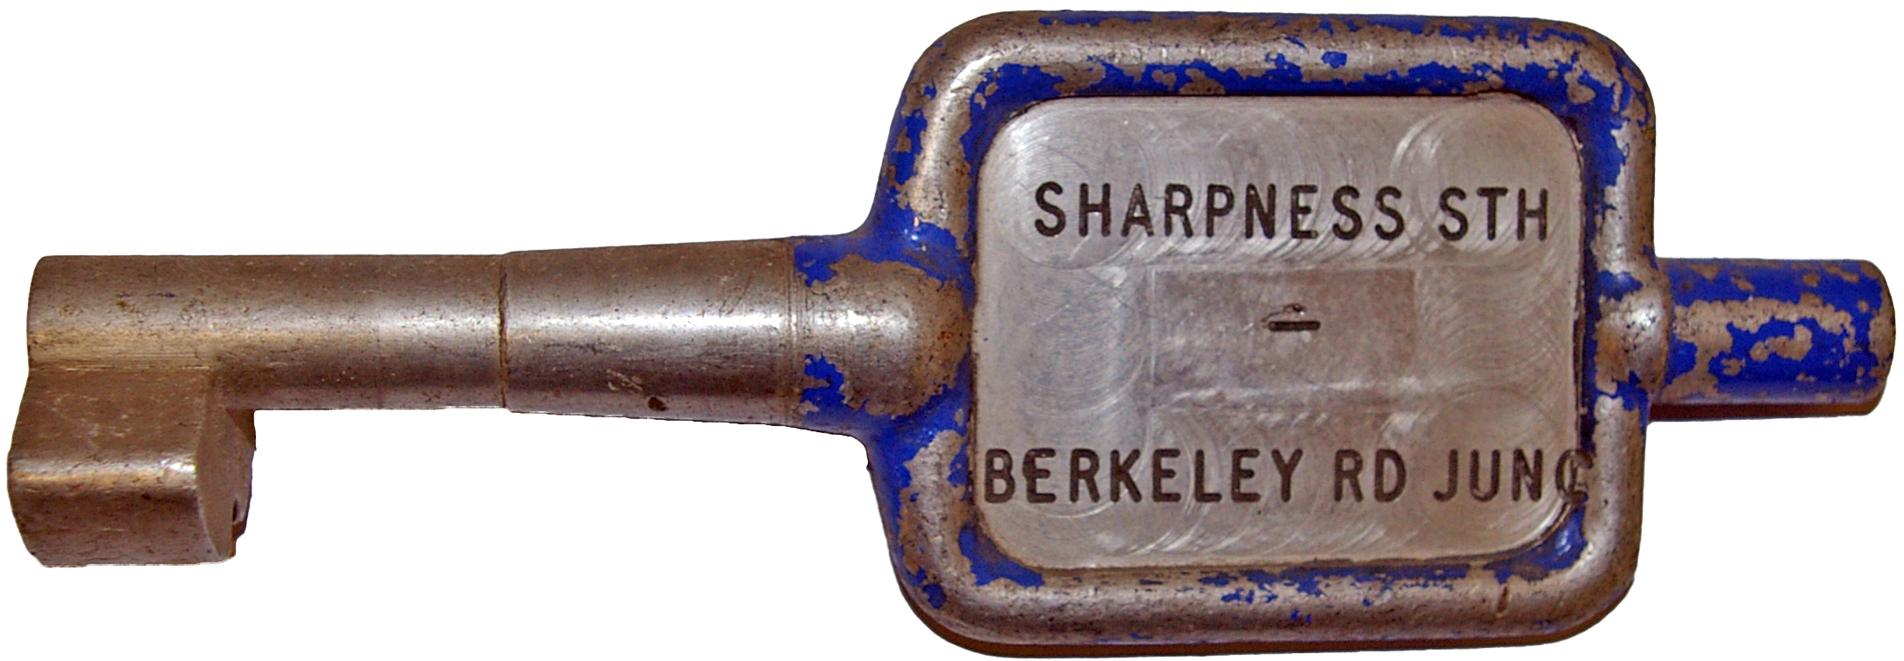 Alloy Key Token SHARPNESS STH - BERKELEY RD JUNC.